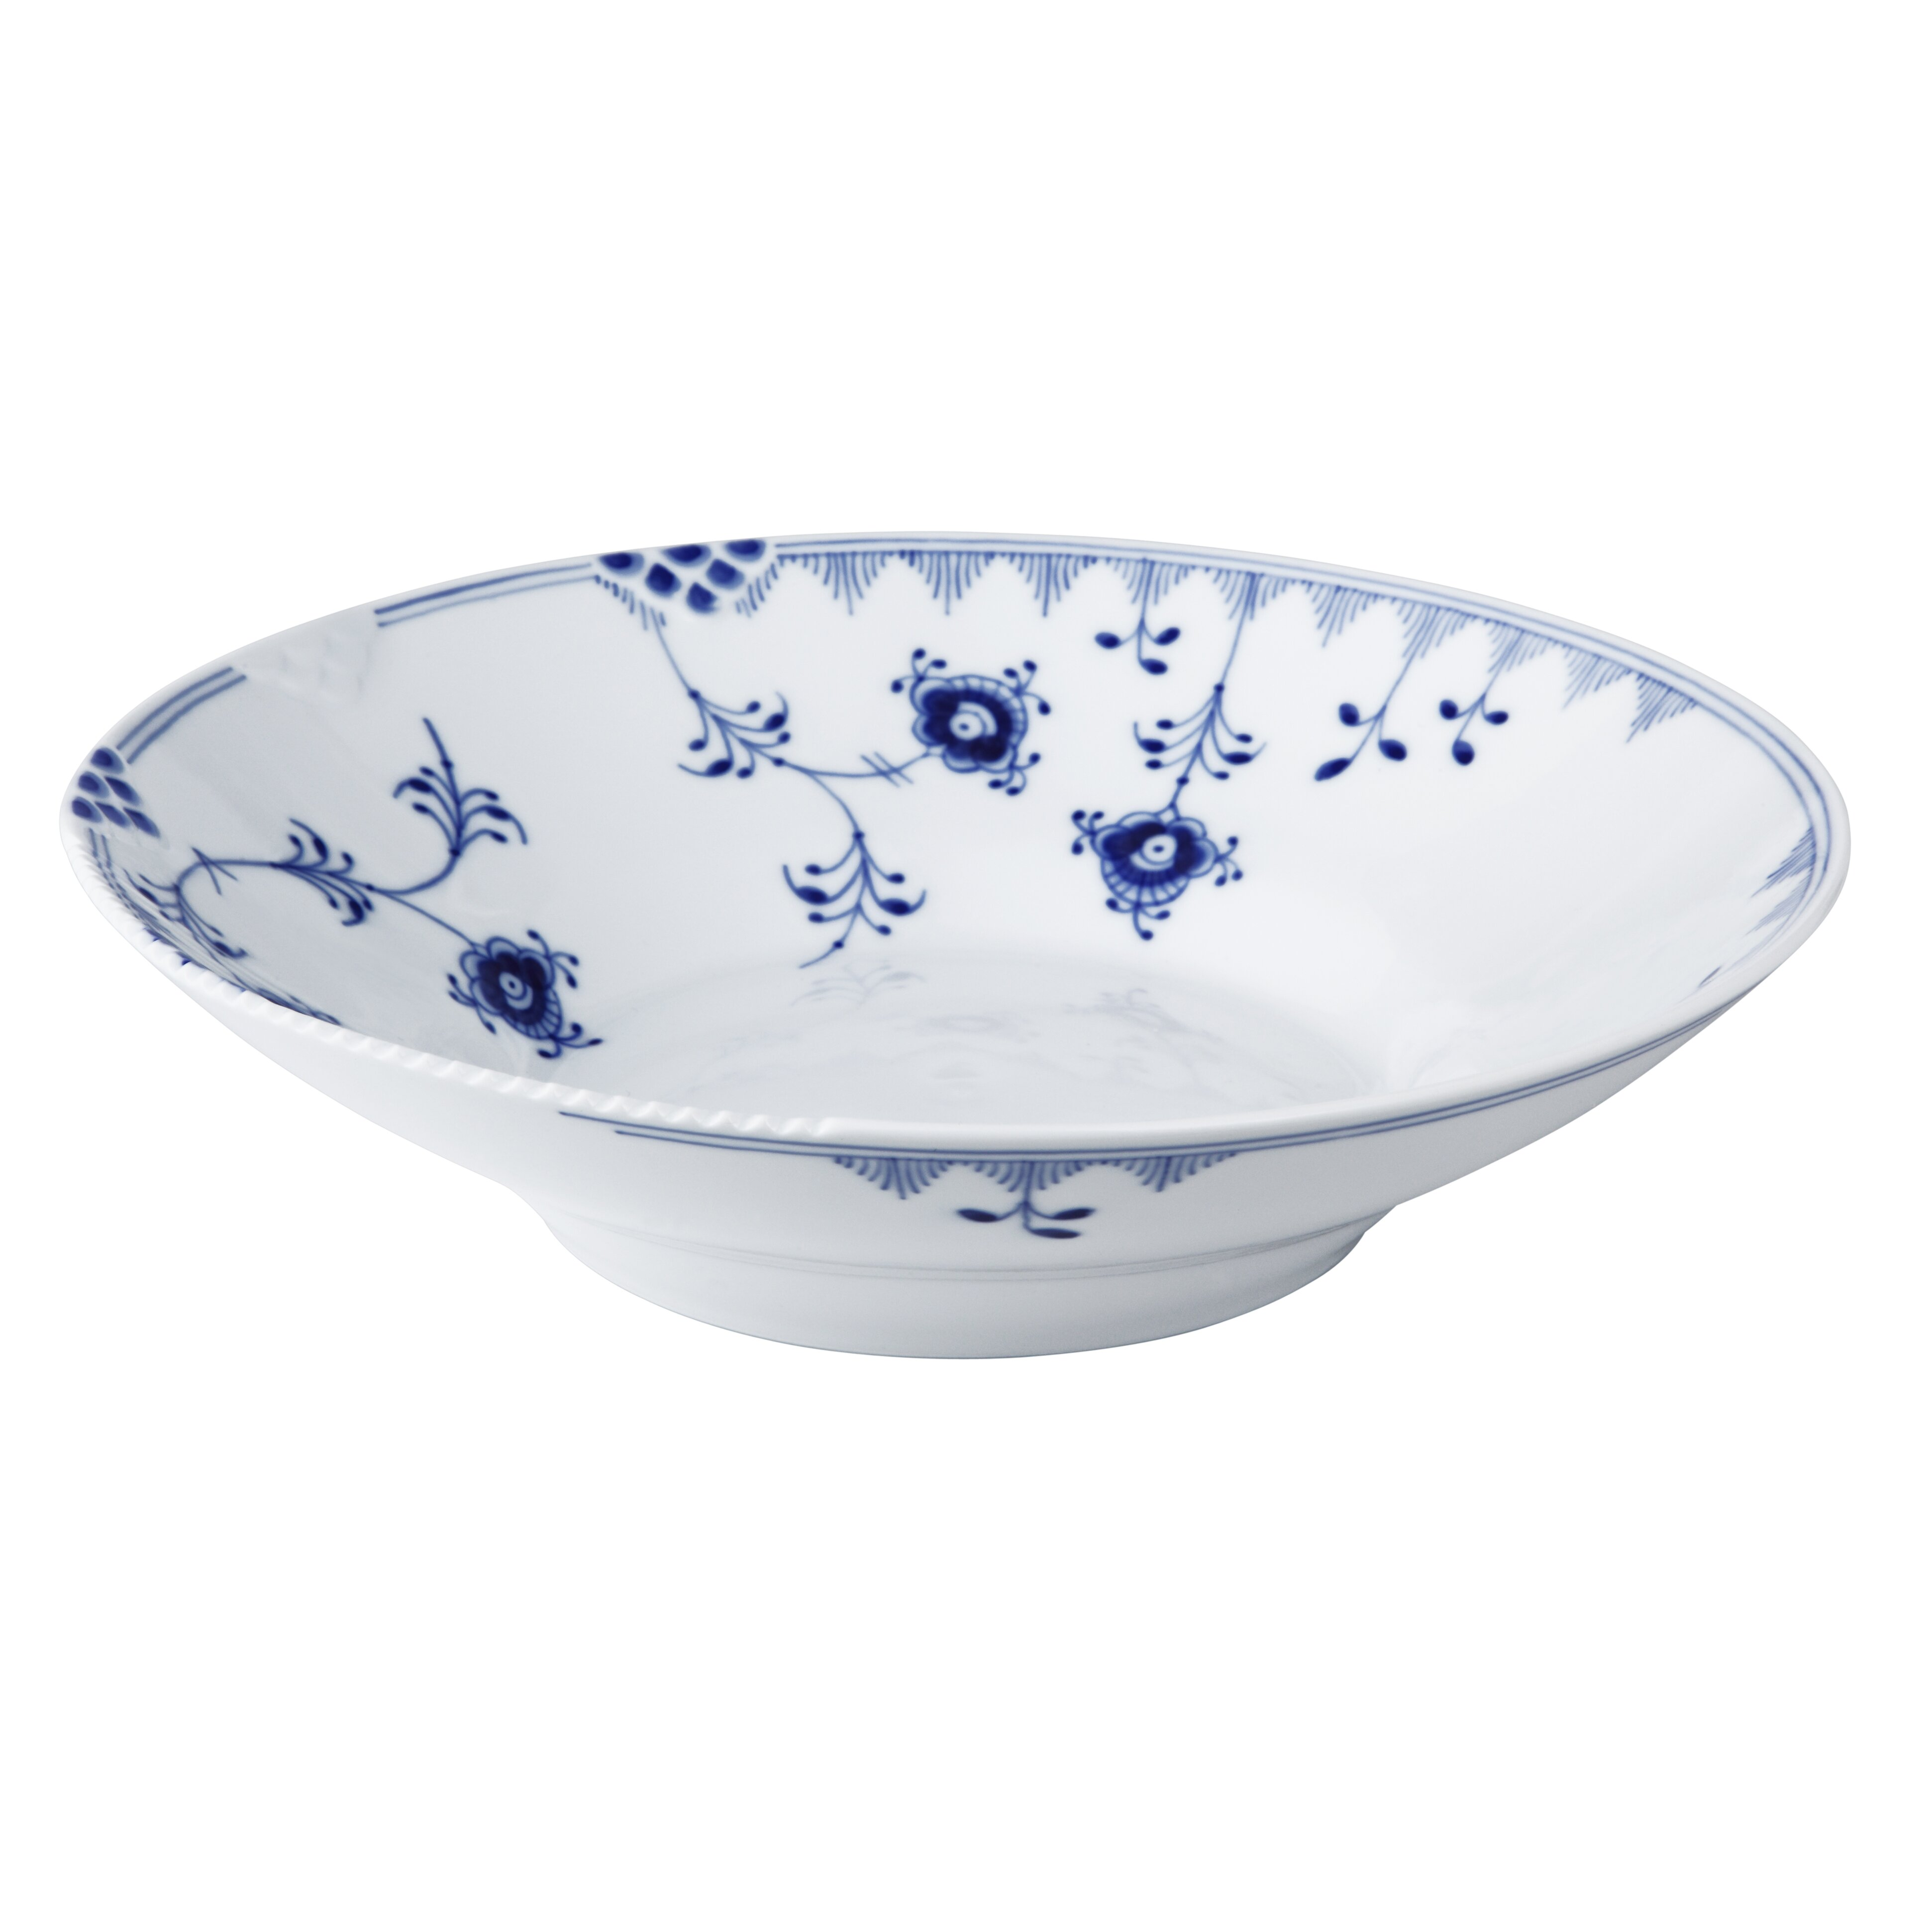 royal copenhagen blue elements pasta bowl wayfair. Black Bedroom Furniture Sets. Home Design Ideas